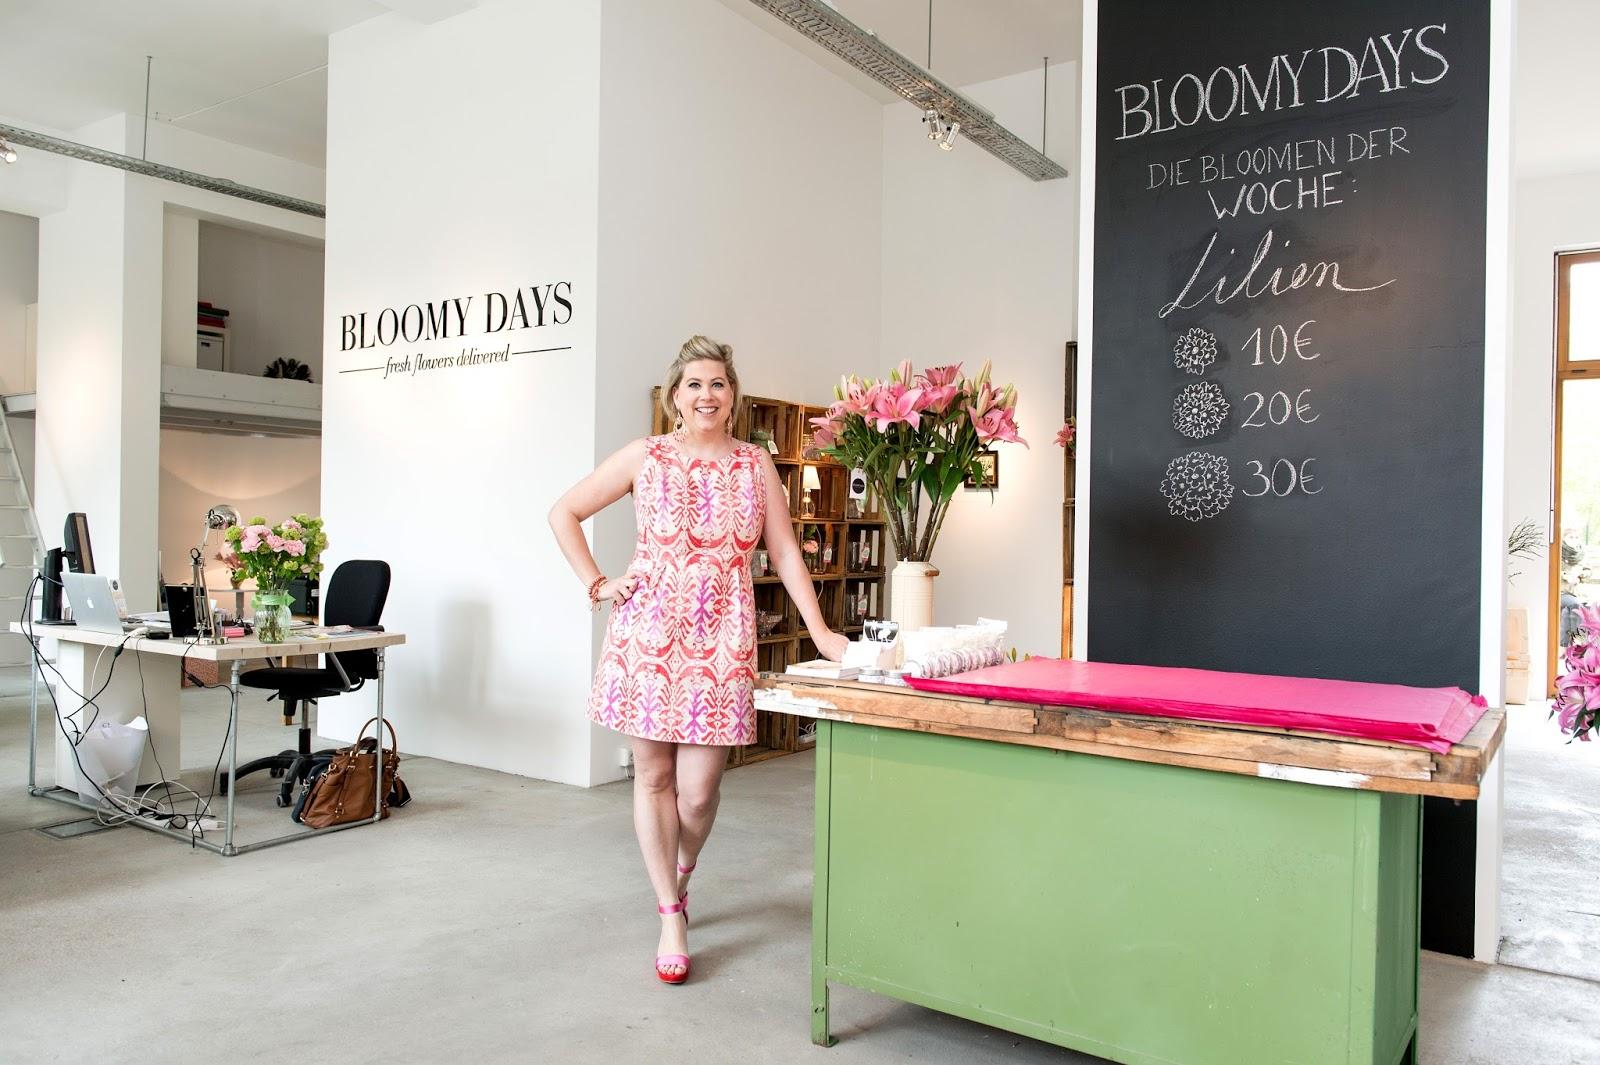 auf der mammilade n seite des lebens personal lifestyle diy and interior blog julia fragt. Black Bedroom Furniture Sets. Home Design Ideas